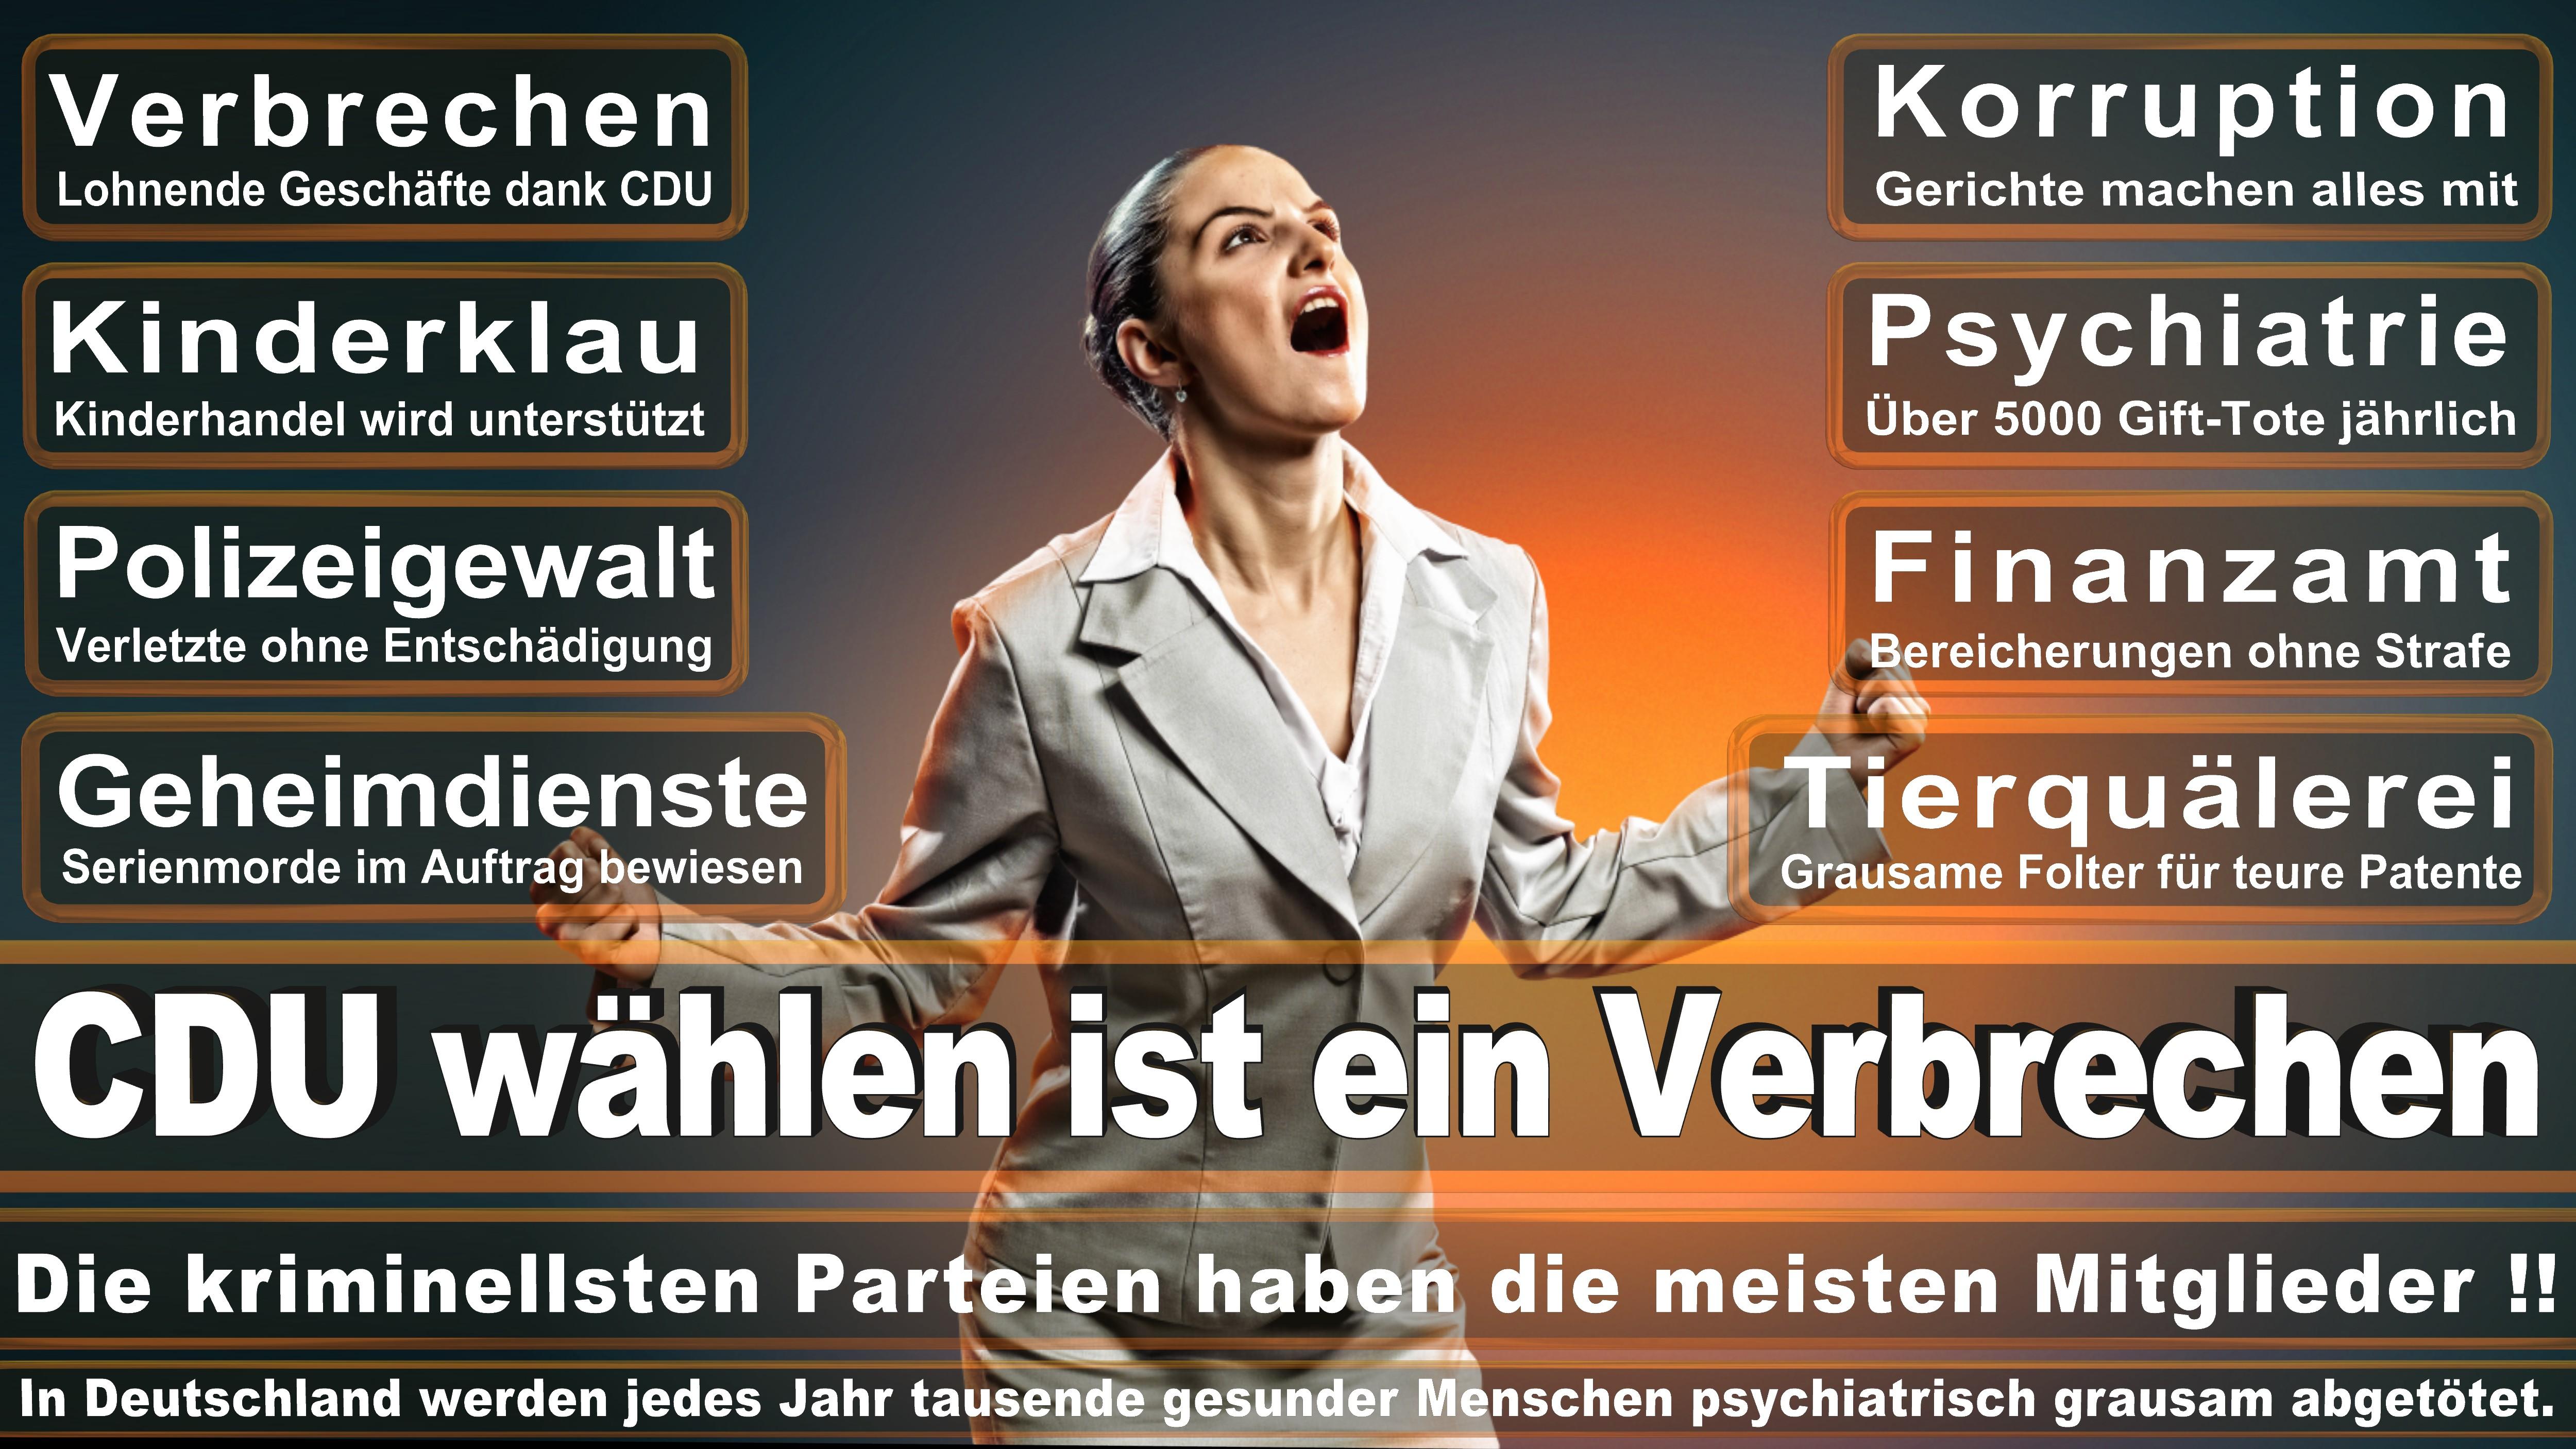 Andre Berghegger CDU CSU Politiker